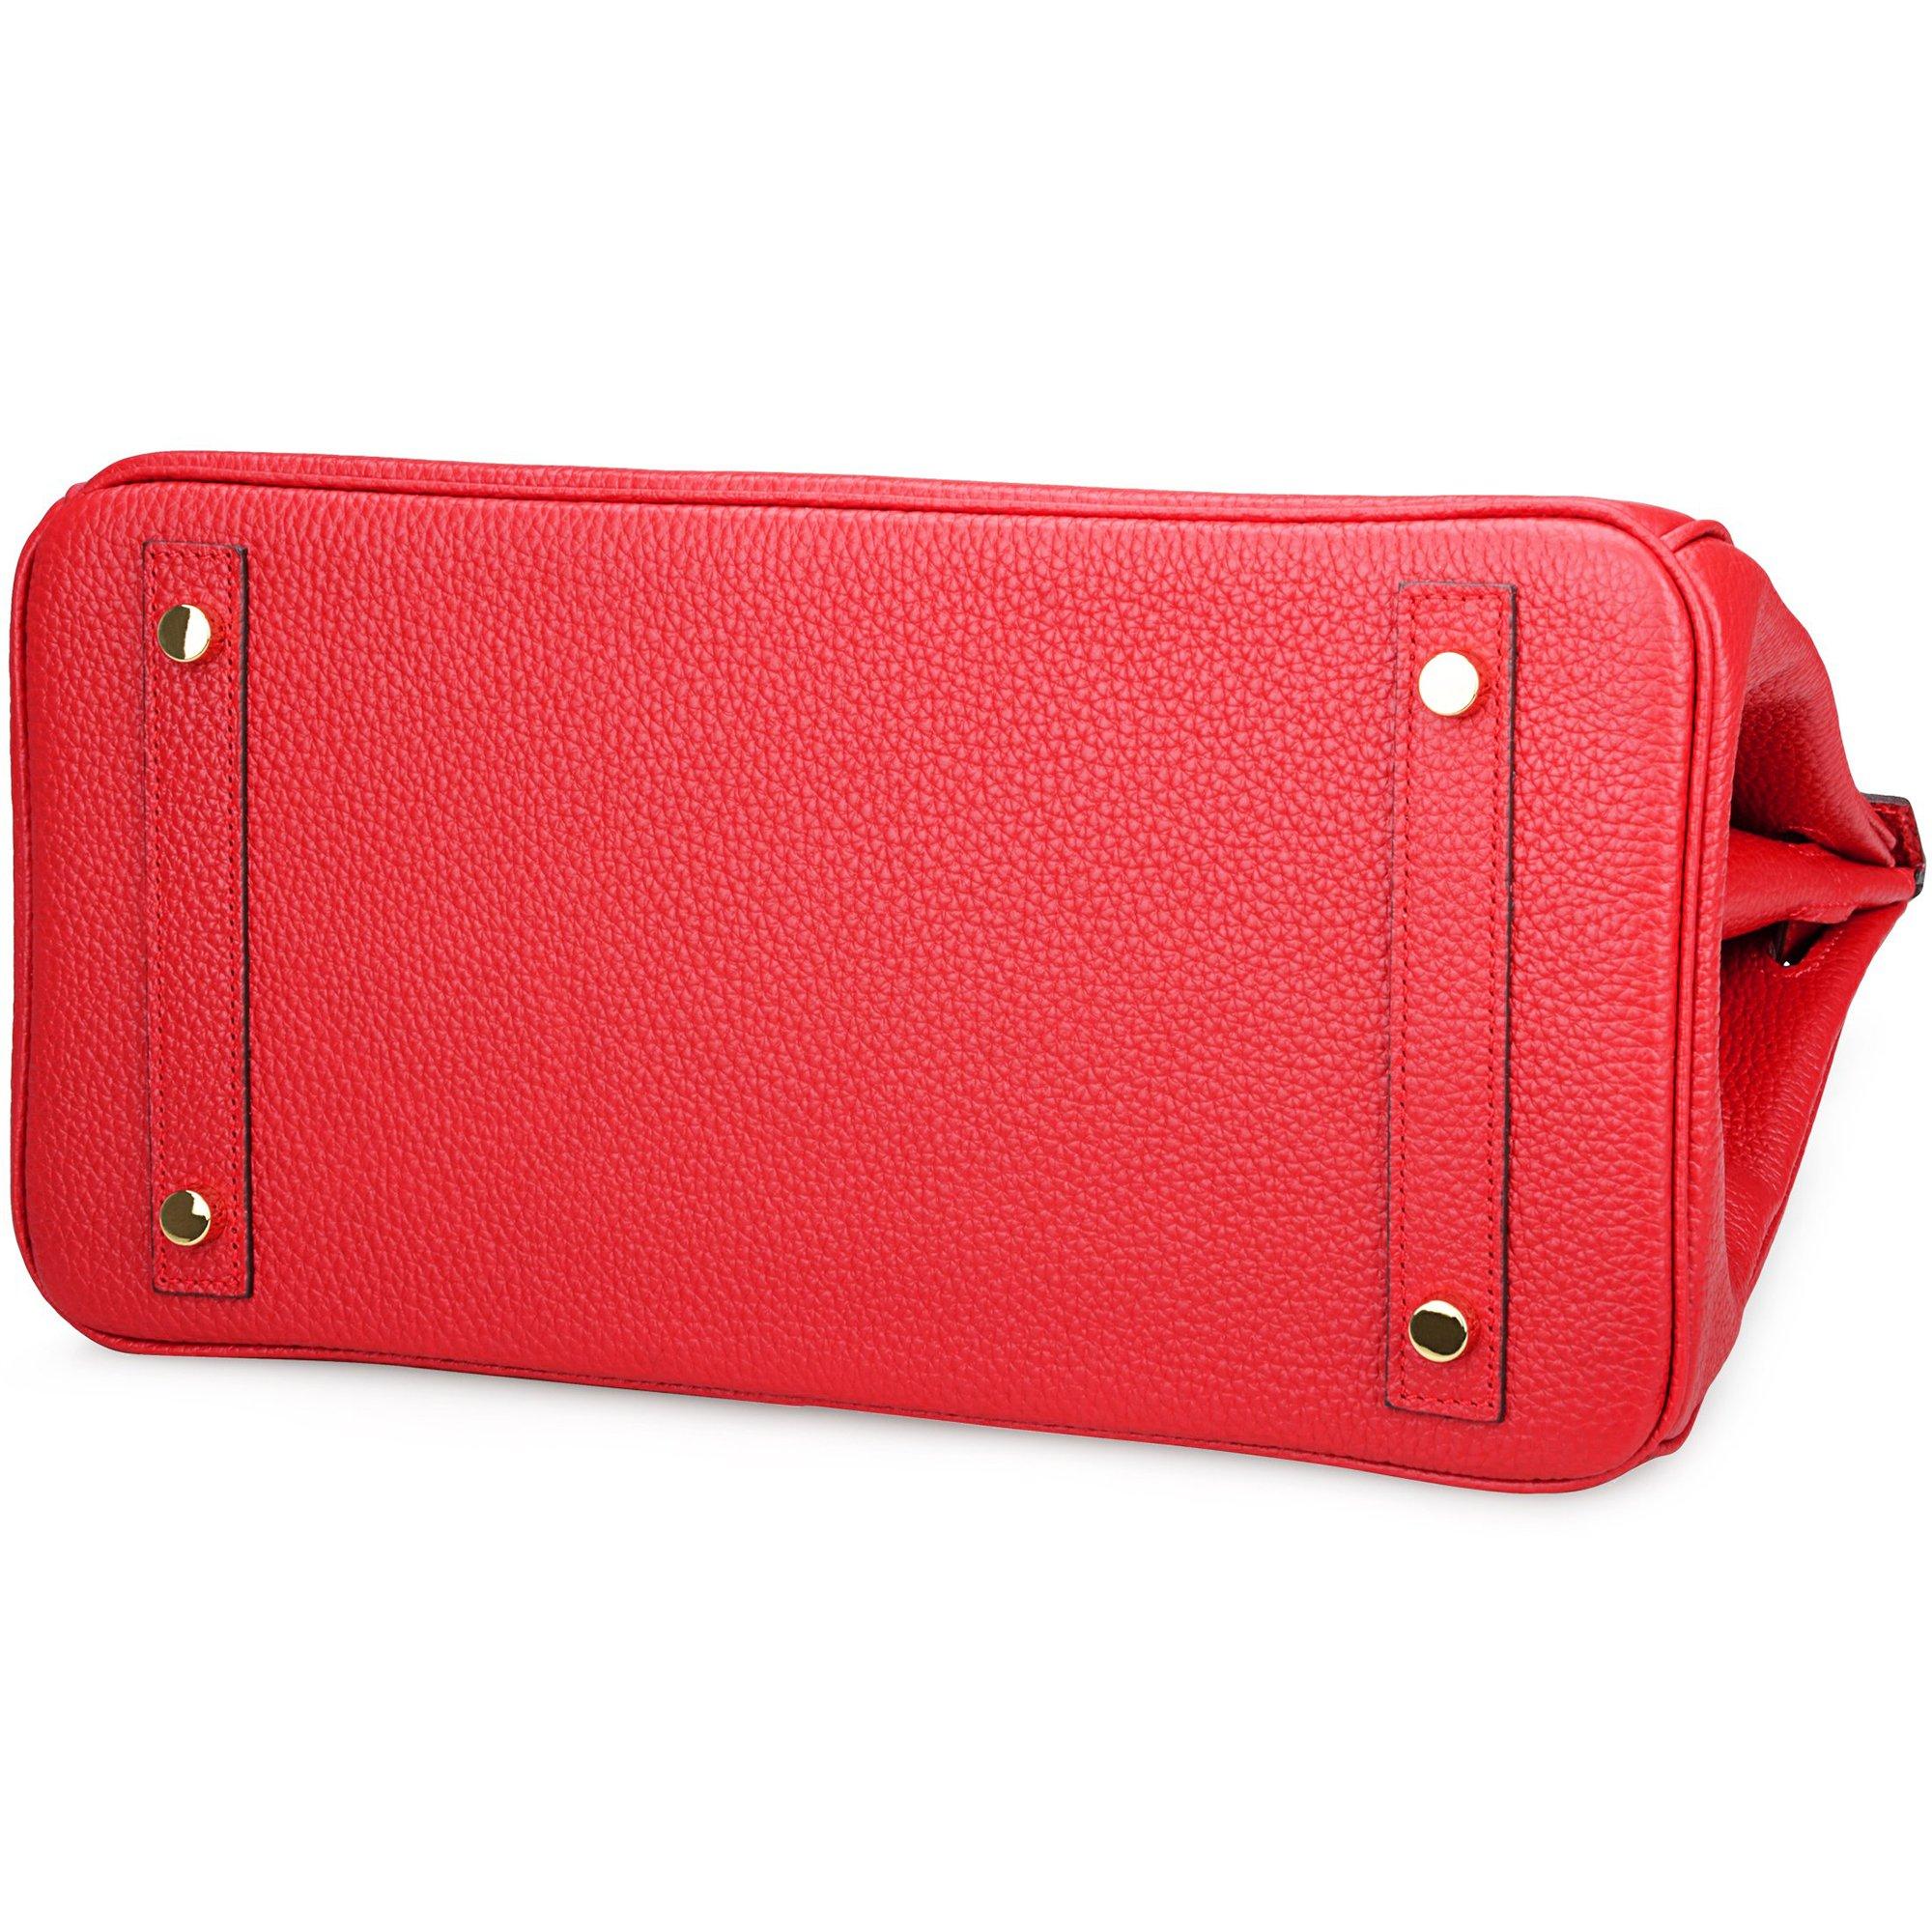 SanMario Designer Handbag Top Handle Padlock Women's Leather Bag with Golden Hardware Red 35cm/14'' by SanMario (Image #8)